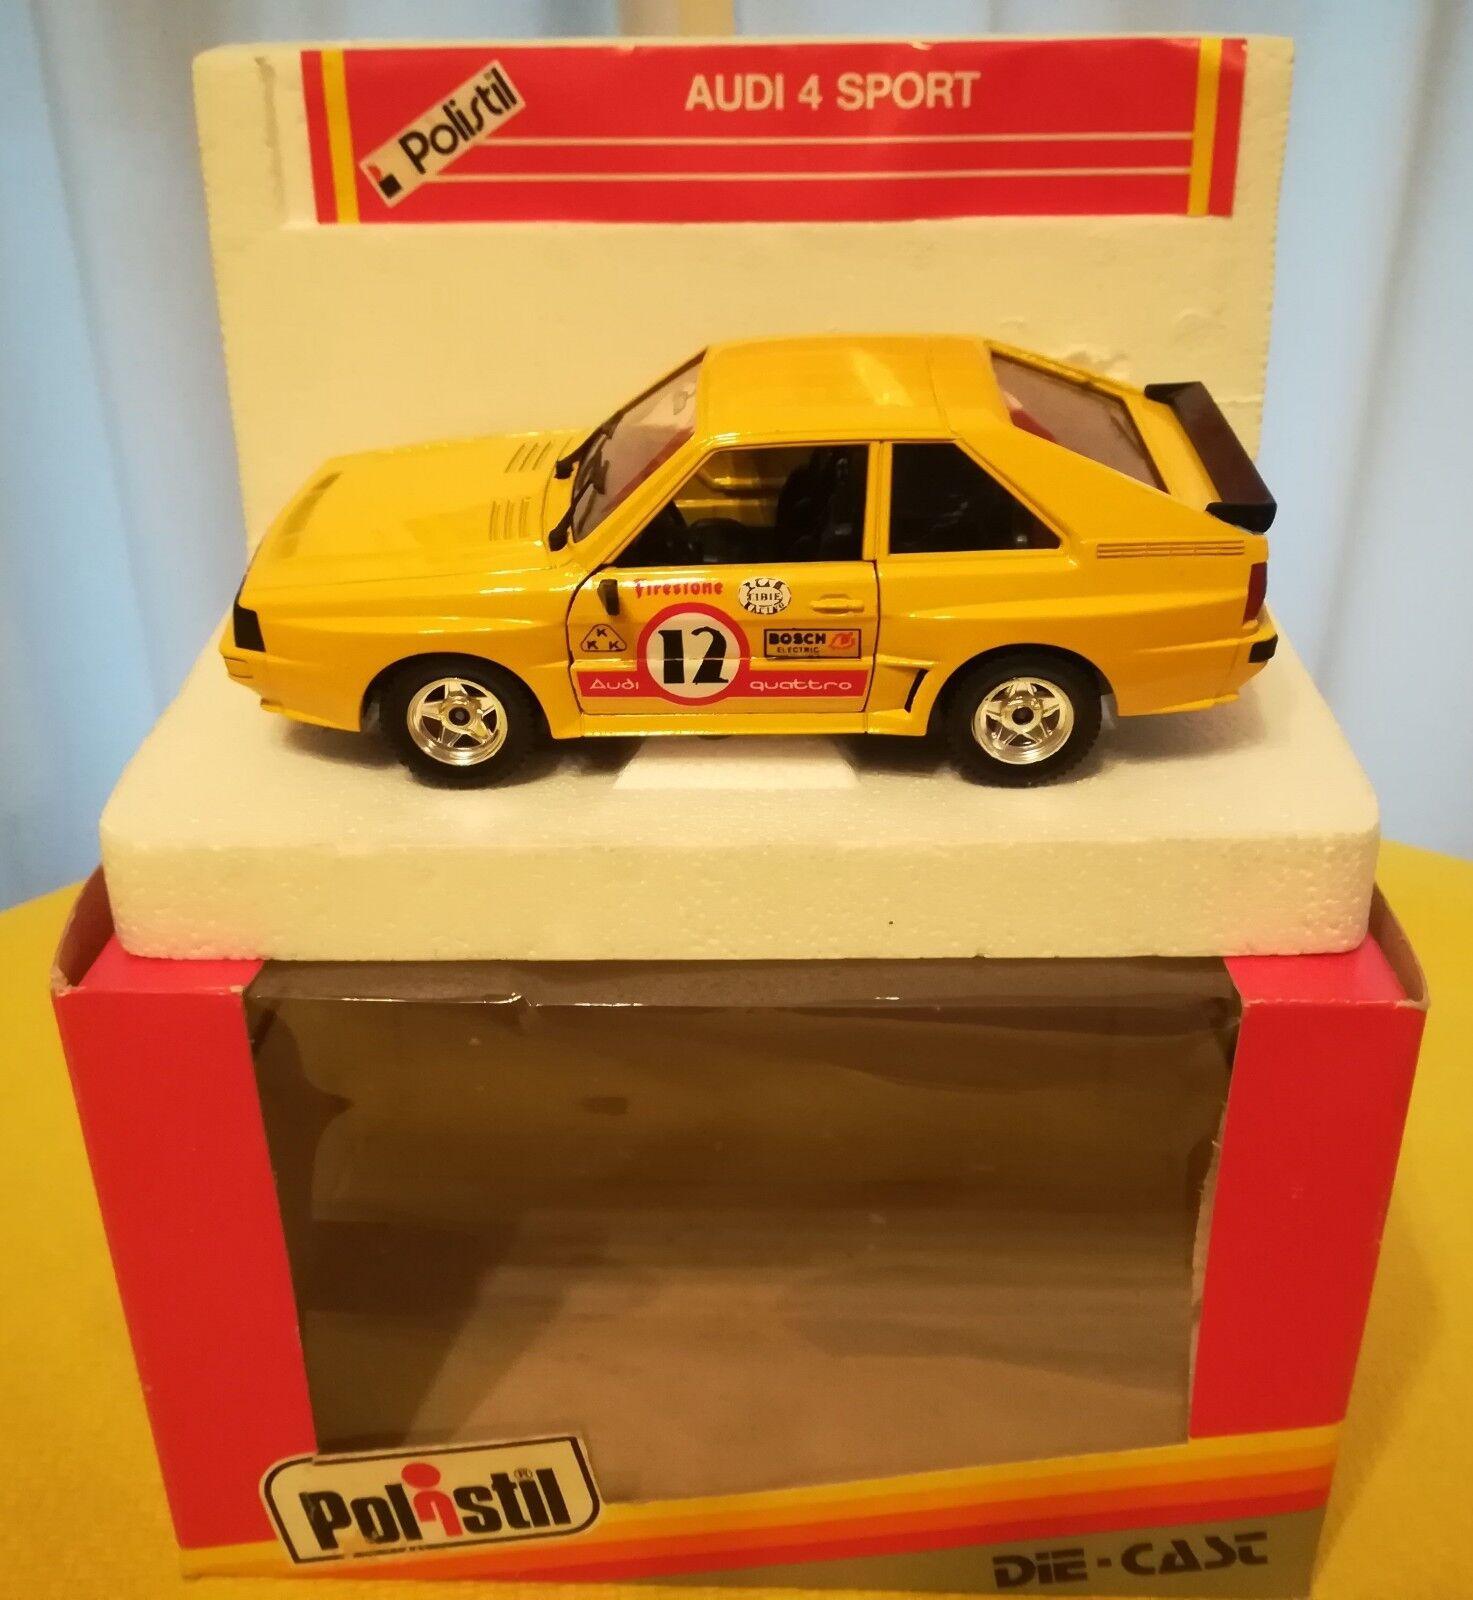 1 25 POLISTIL Serie S Audi Quattro Sport  12 MIB - No Burago Mebetoys Politoys